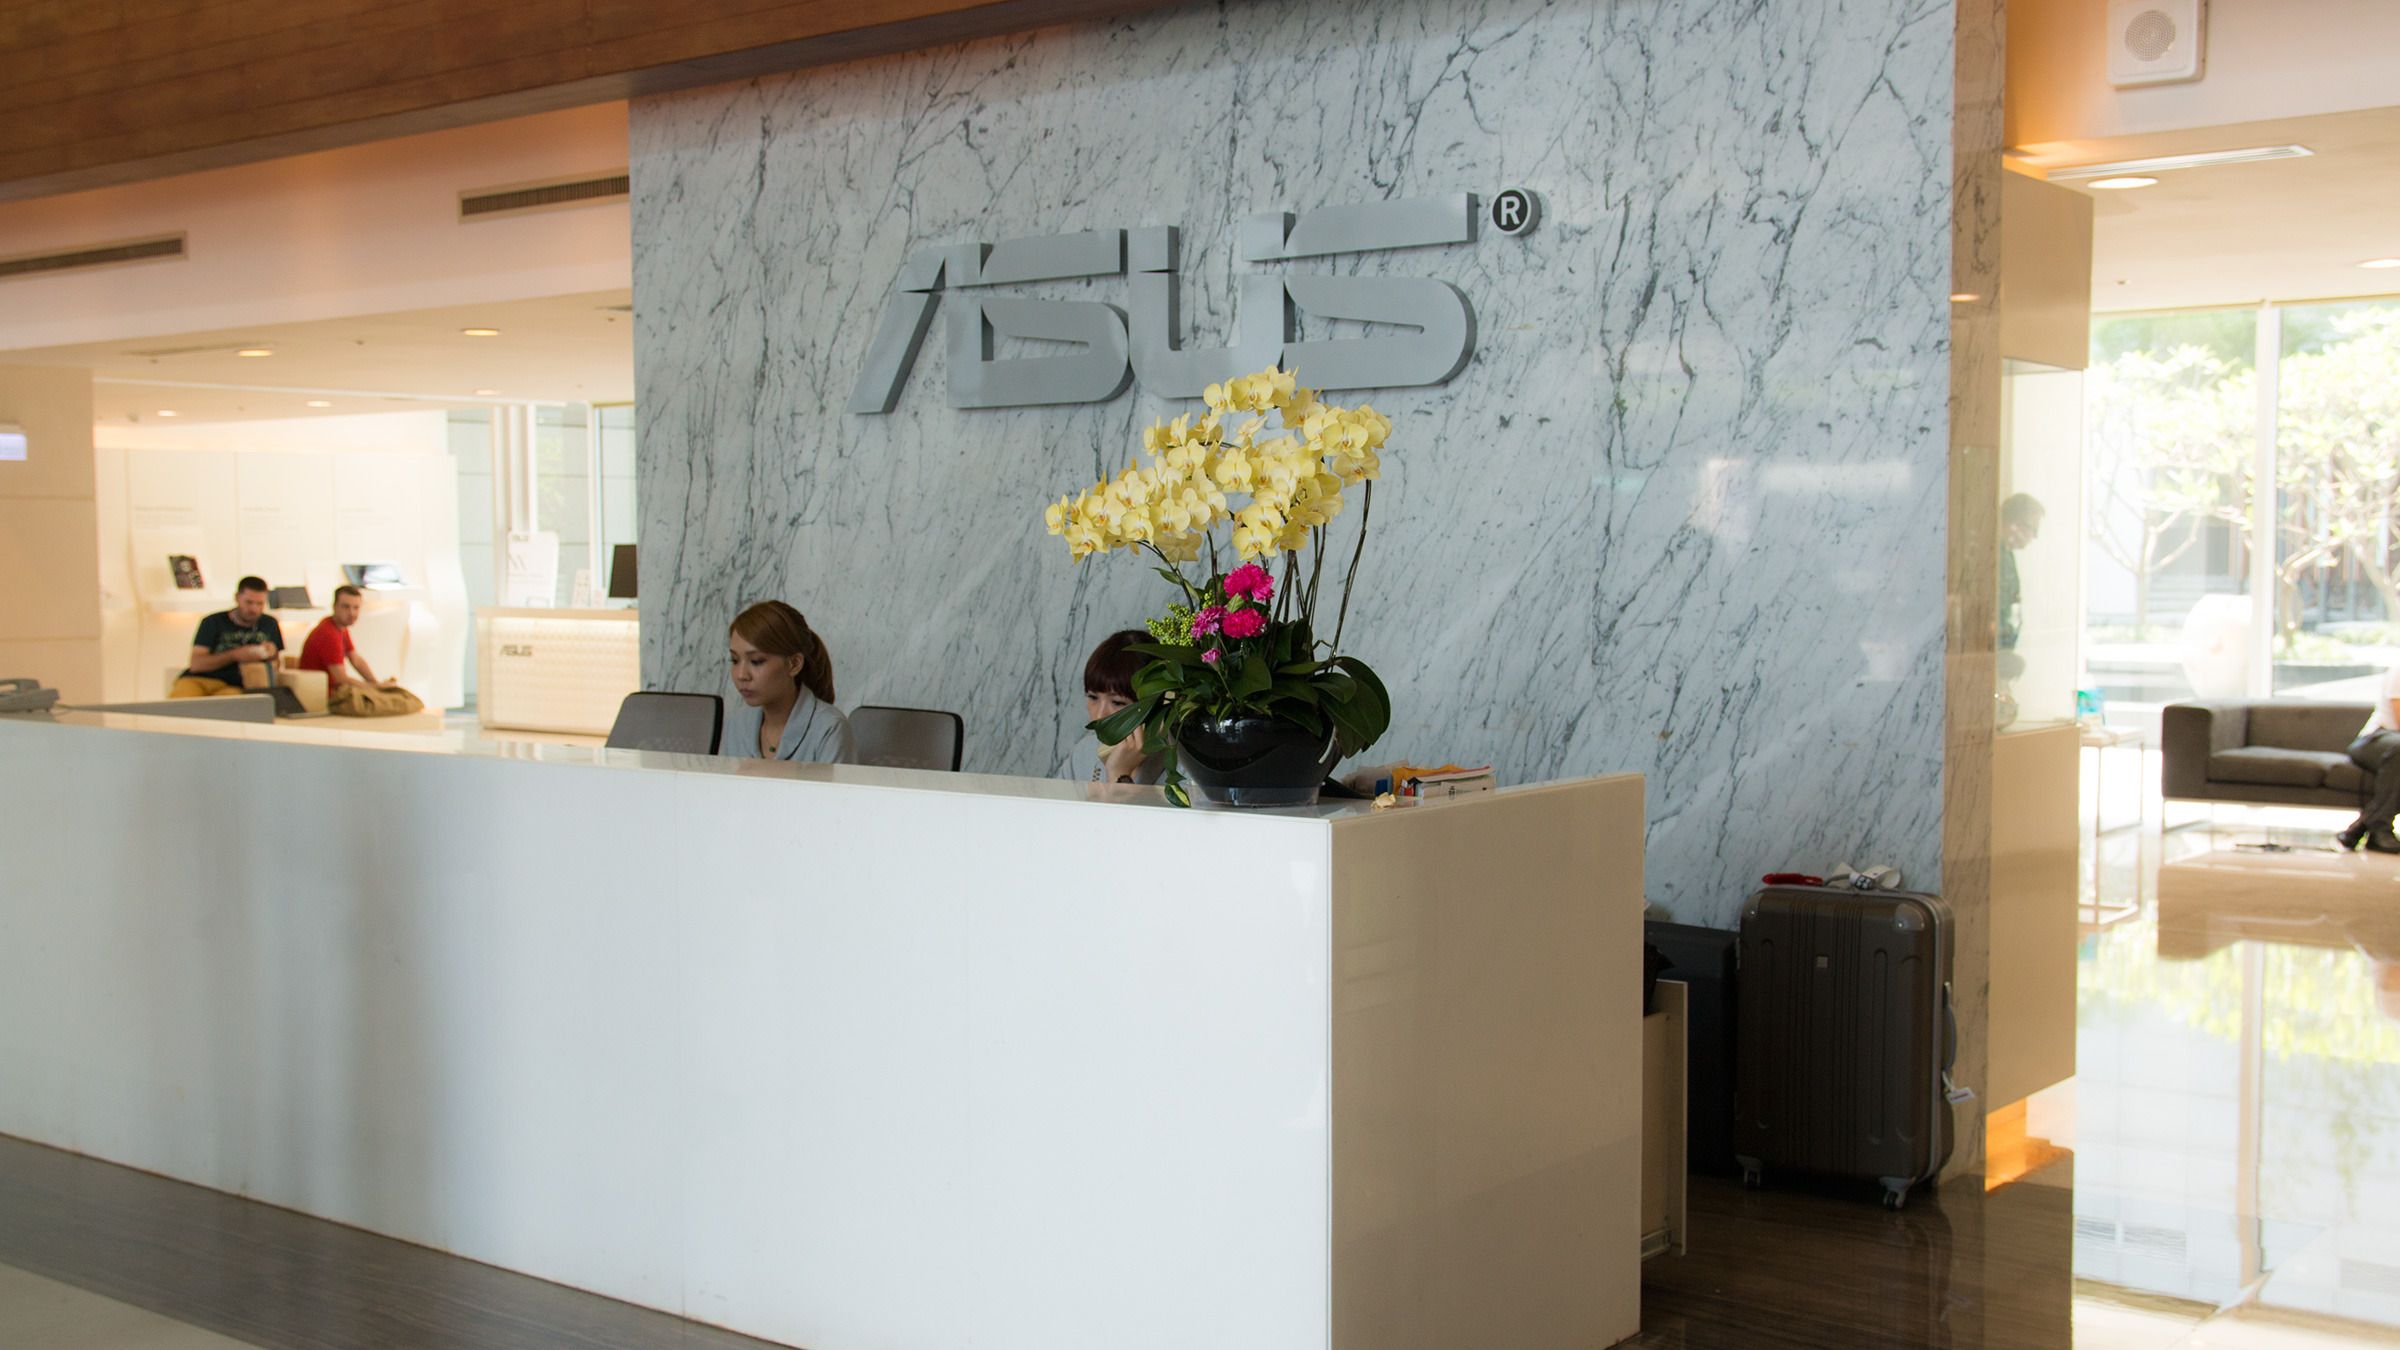 Lobbyen i Asus' hovedkvarter er lys, åpen og luftig, og det er stadig noen som kommer og går.Foto: Varg Aamo, Hardware.no